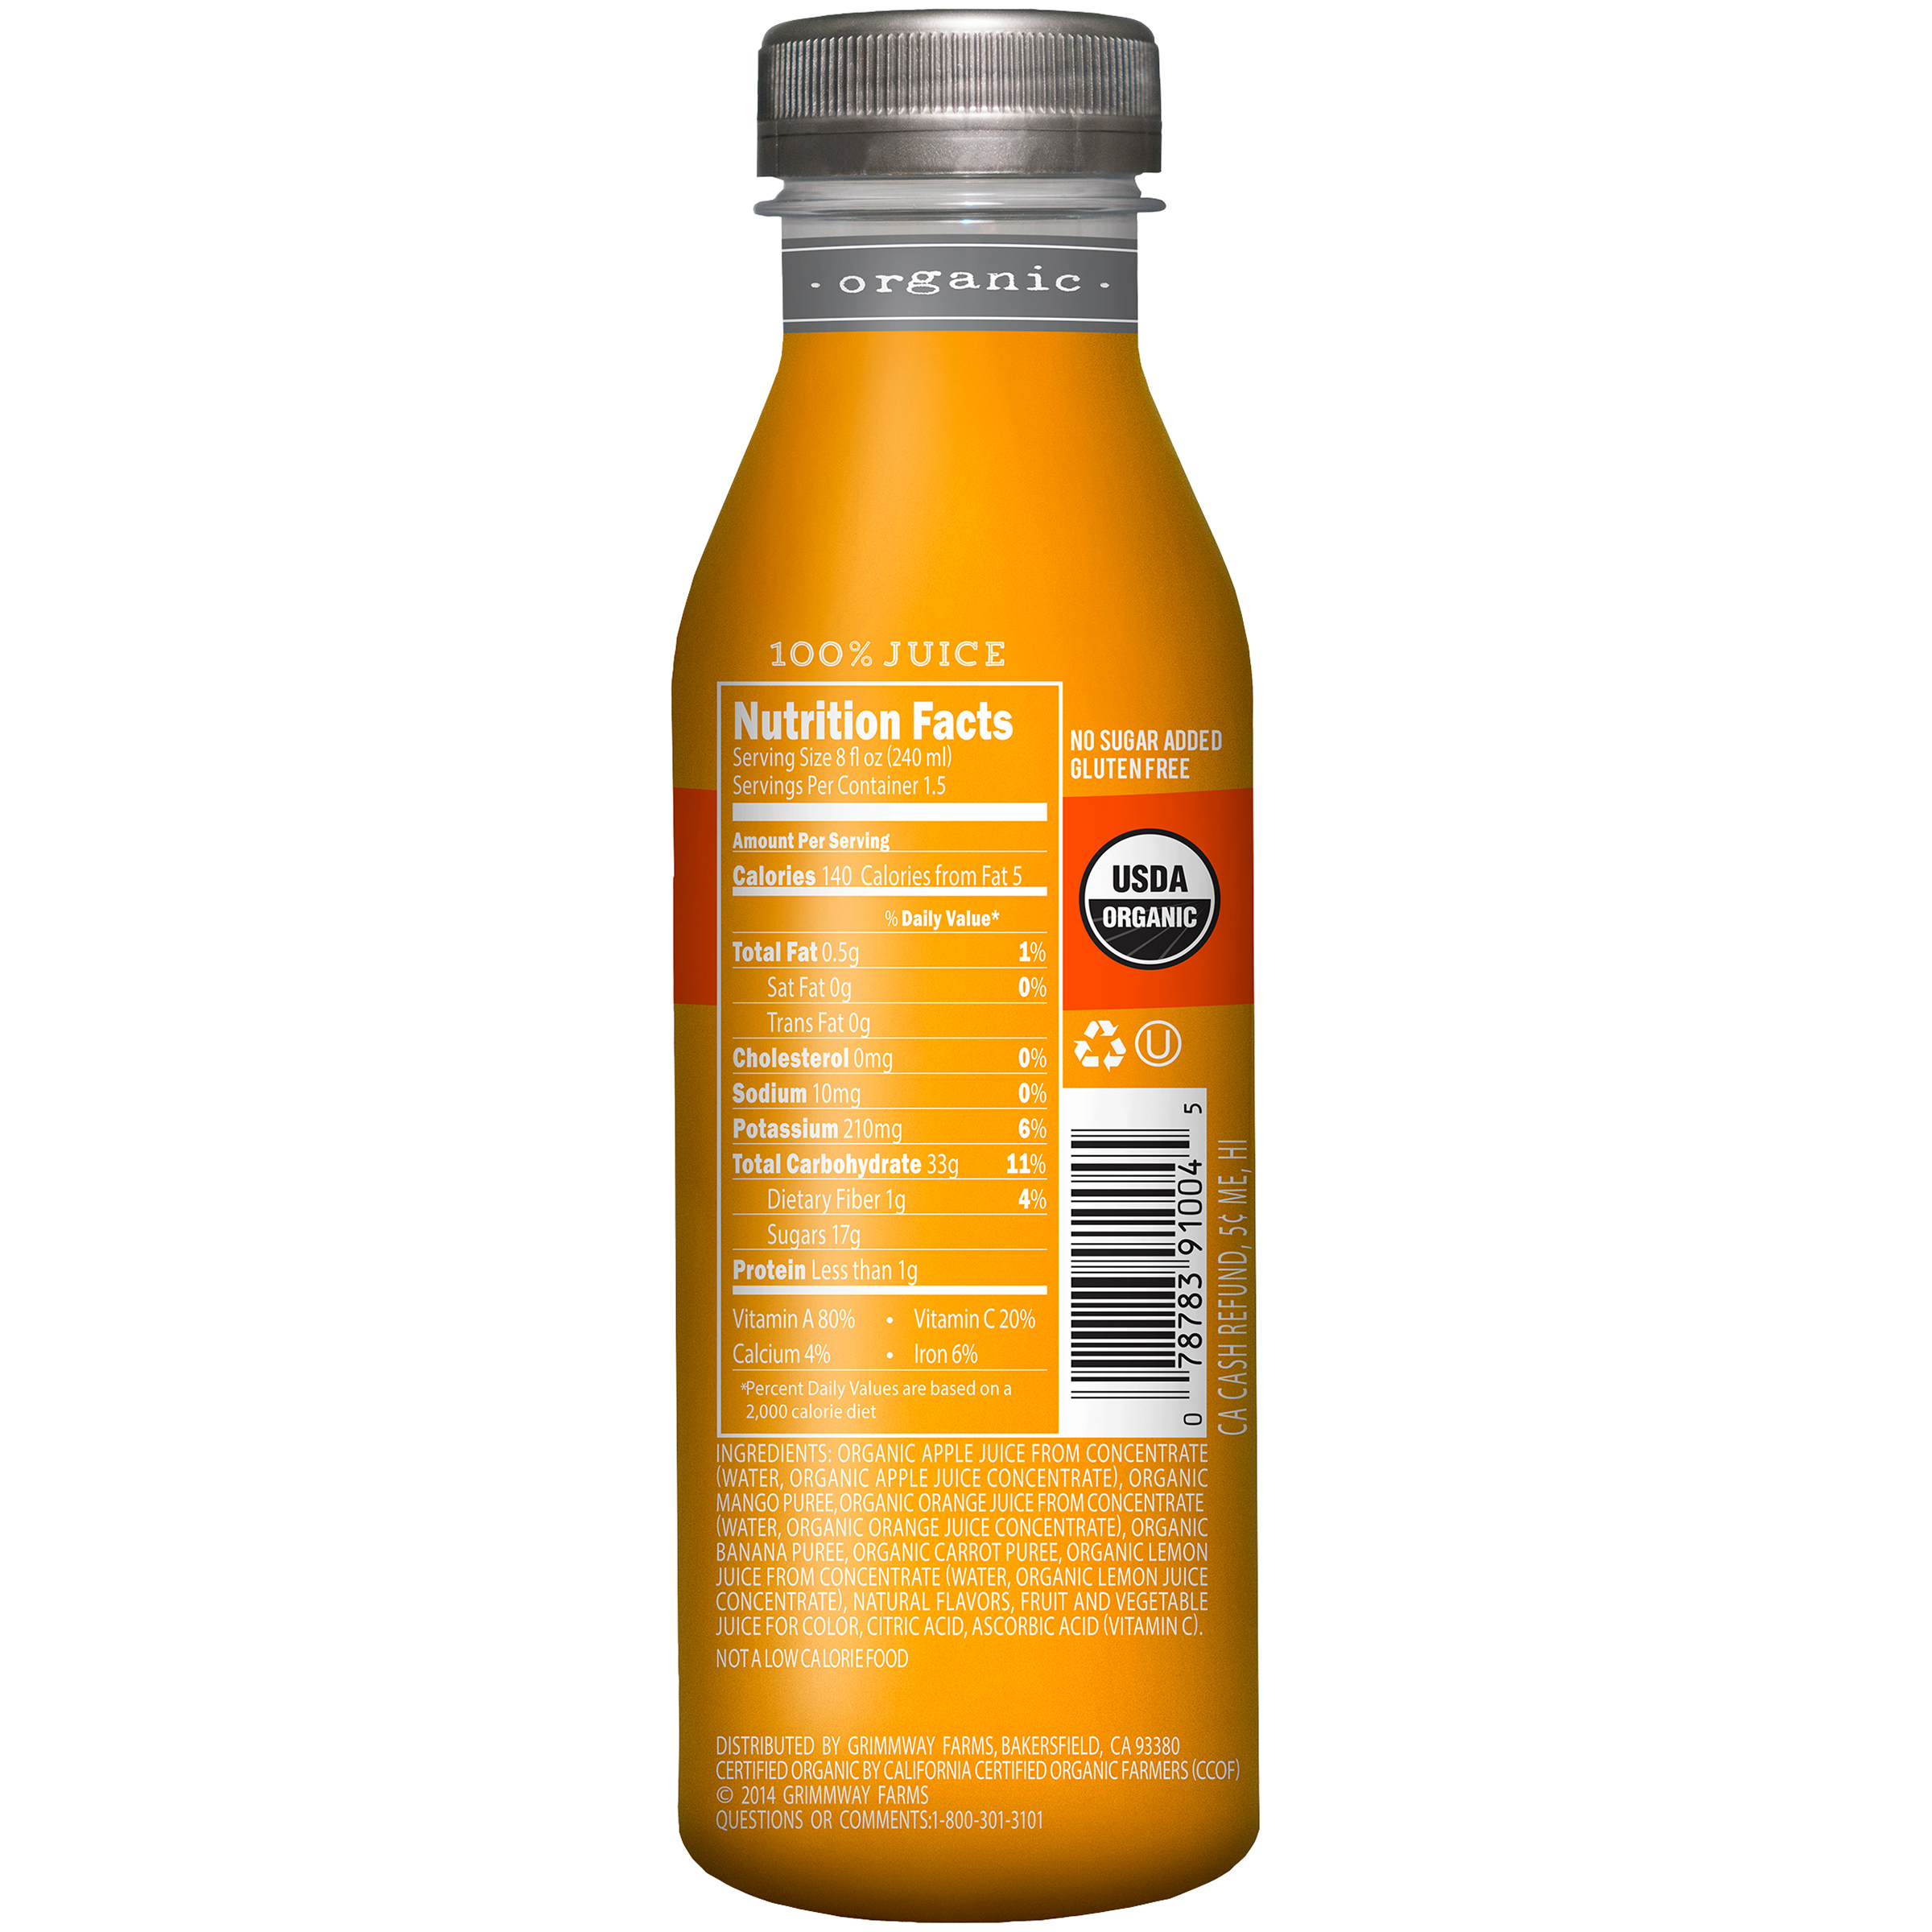 True Organic Organic Tropical Mango Juice 12oz - Walmart com